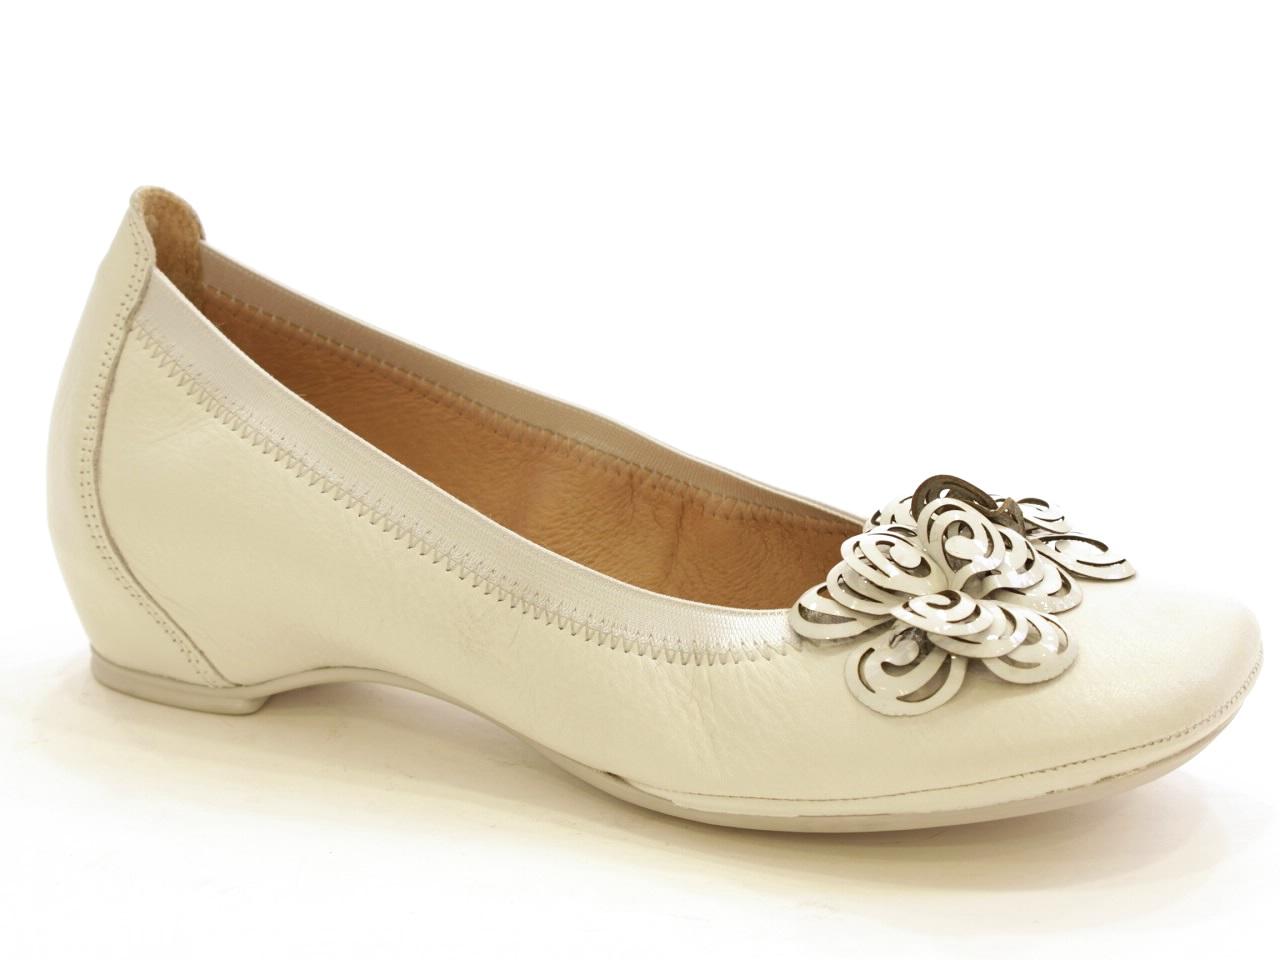 Wedge Shoes Hispanitas - 165 HV49446